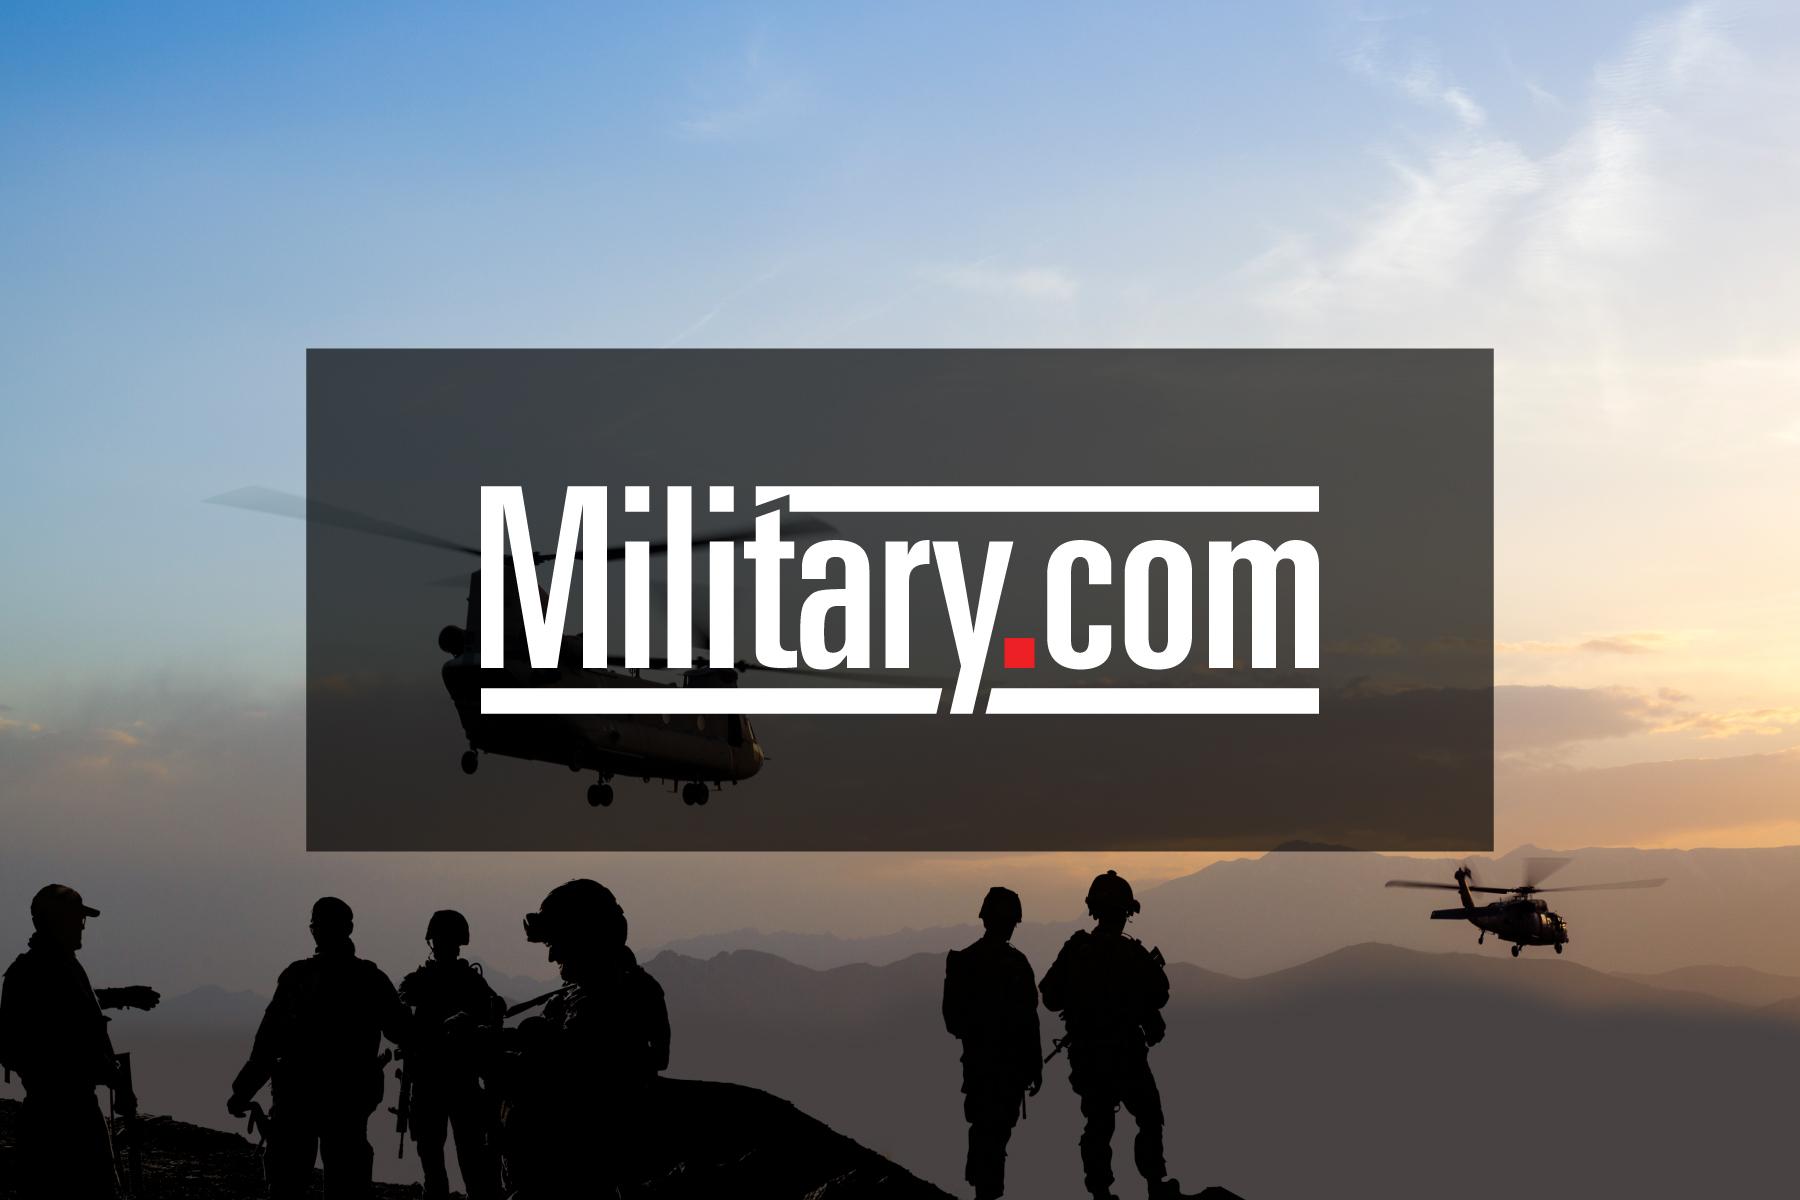 Texas Service Held for Vietnam War Pilot Killed in 1967